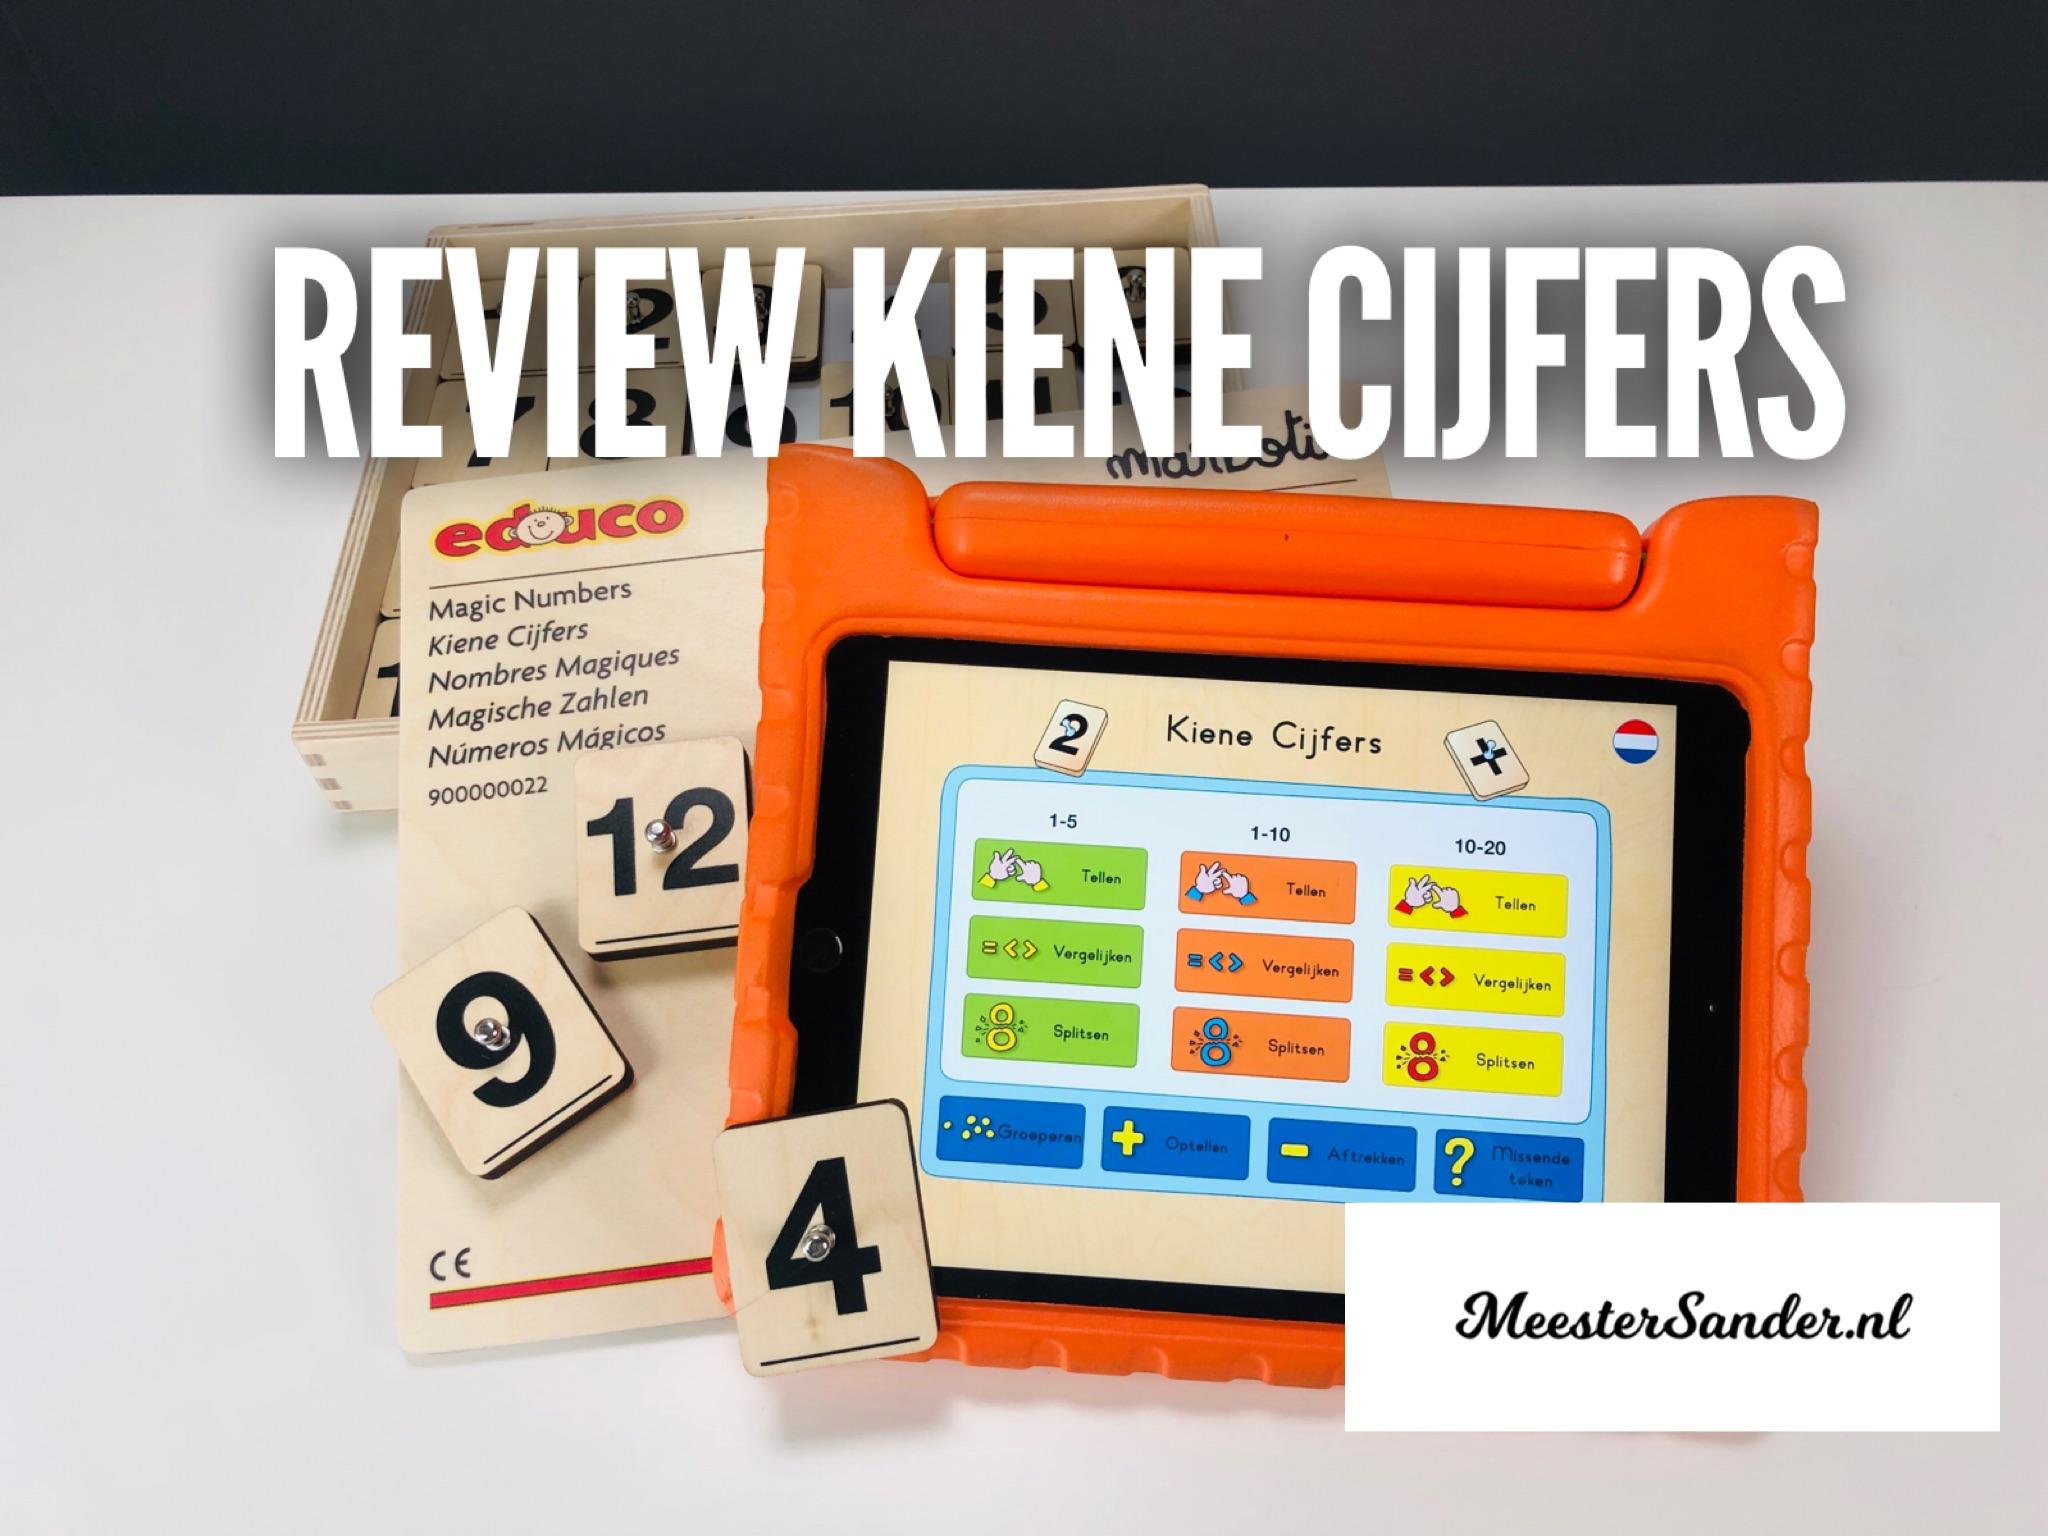 Review Kiene Cijfers